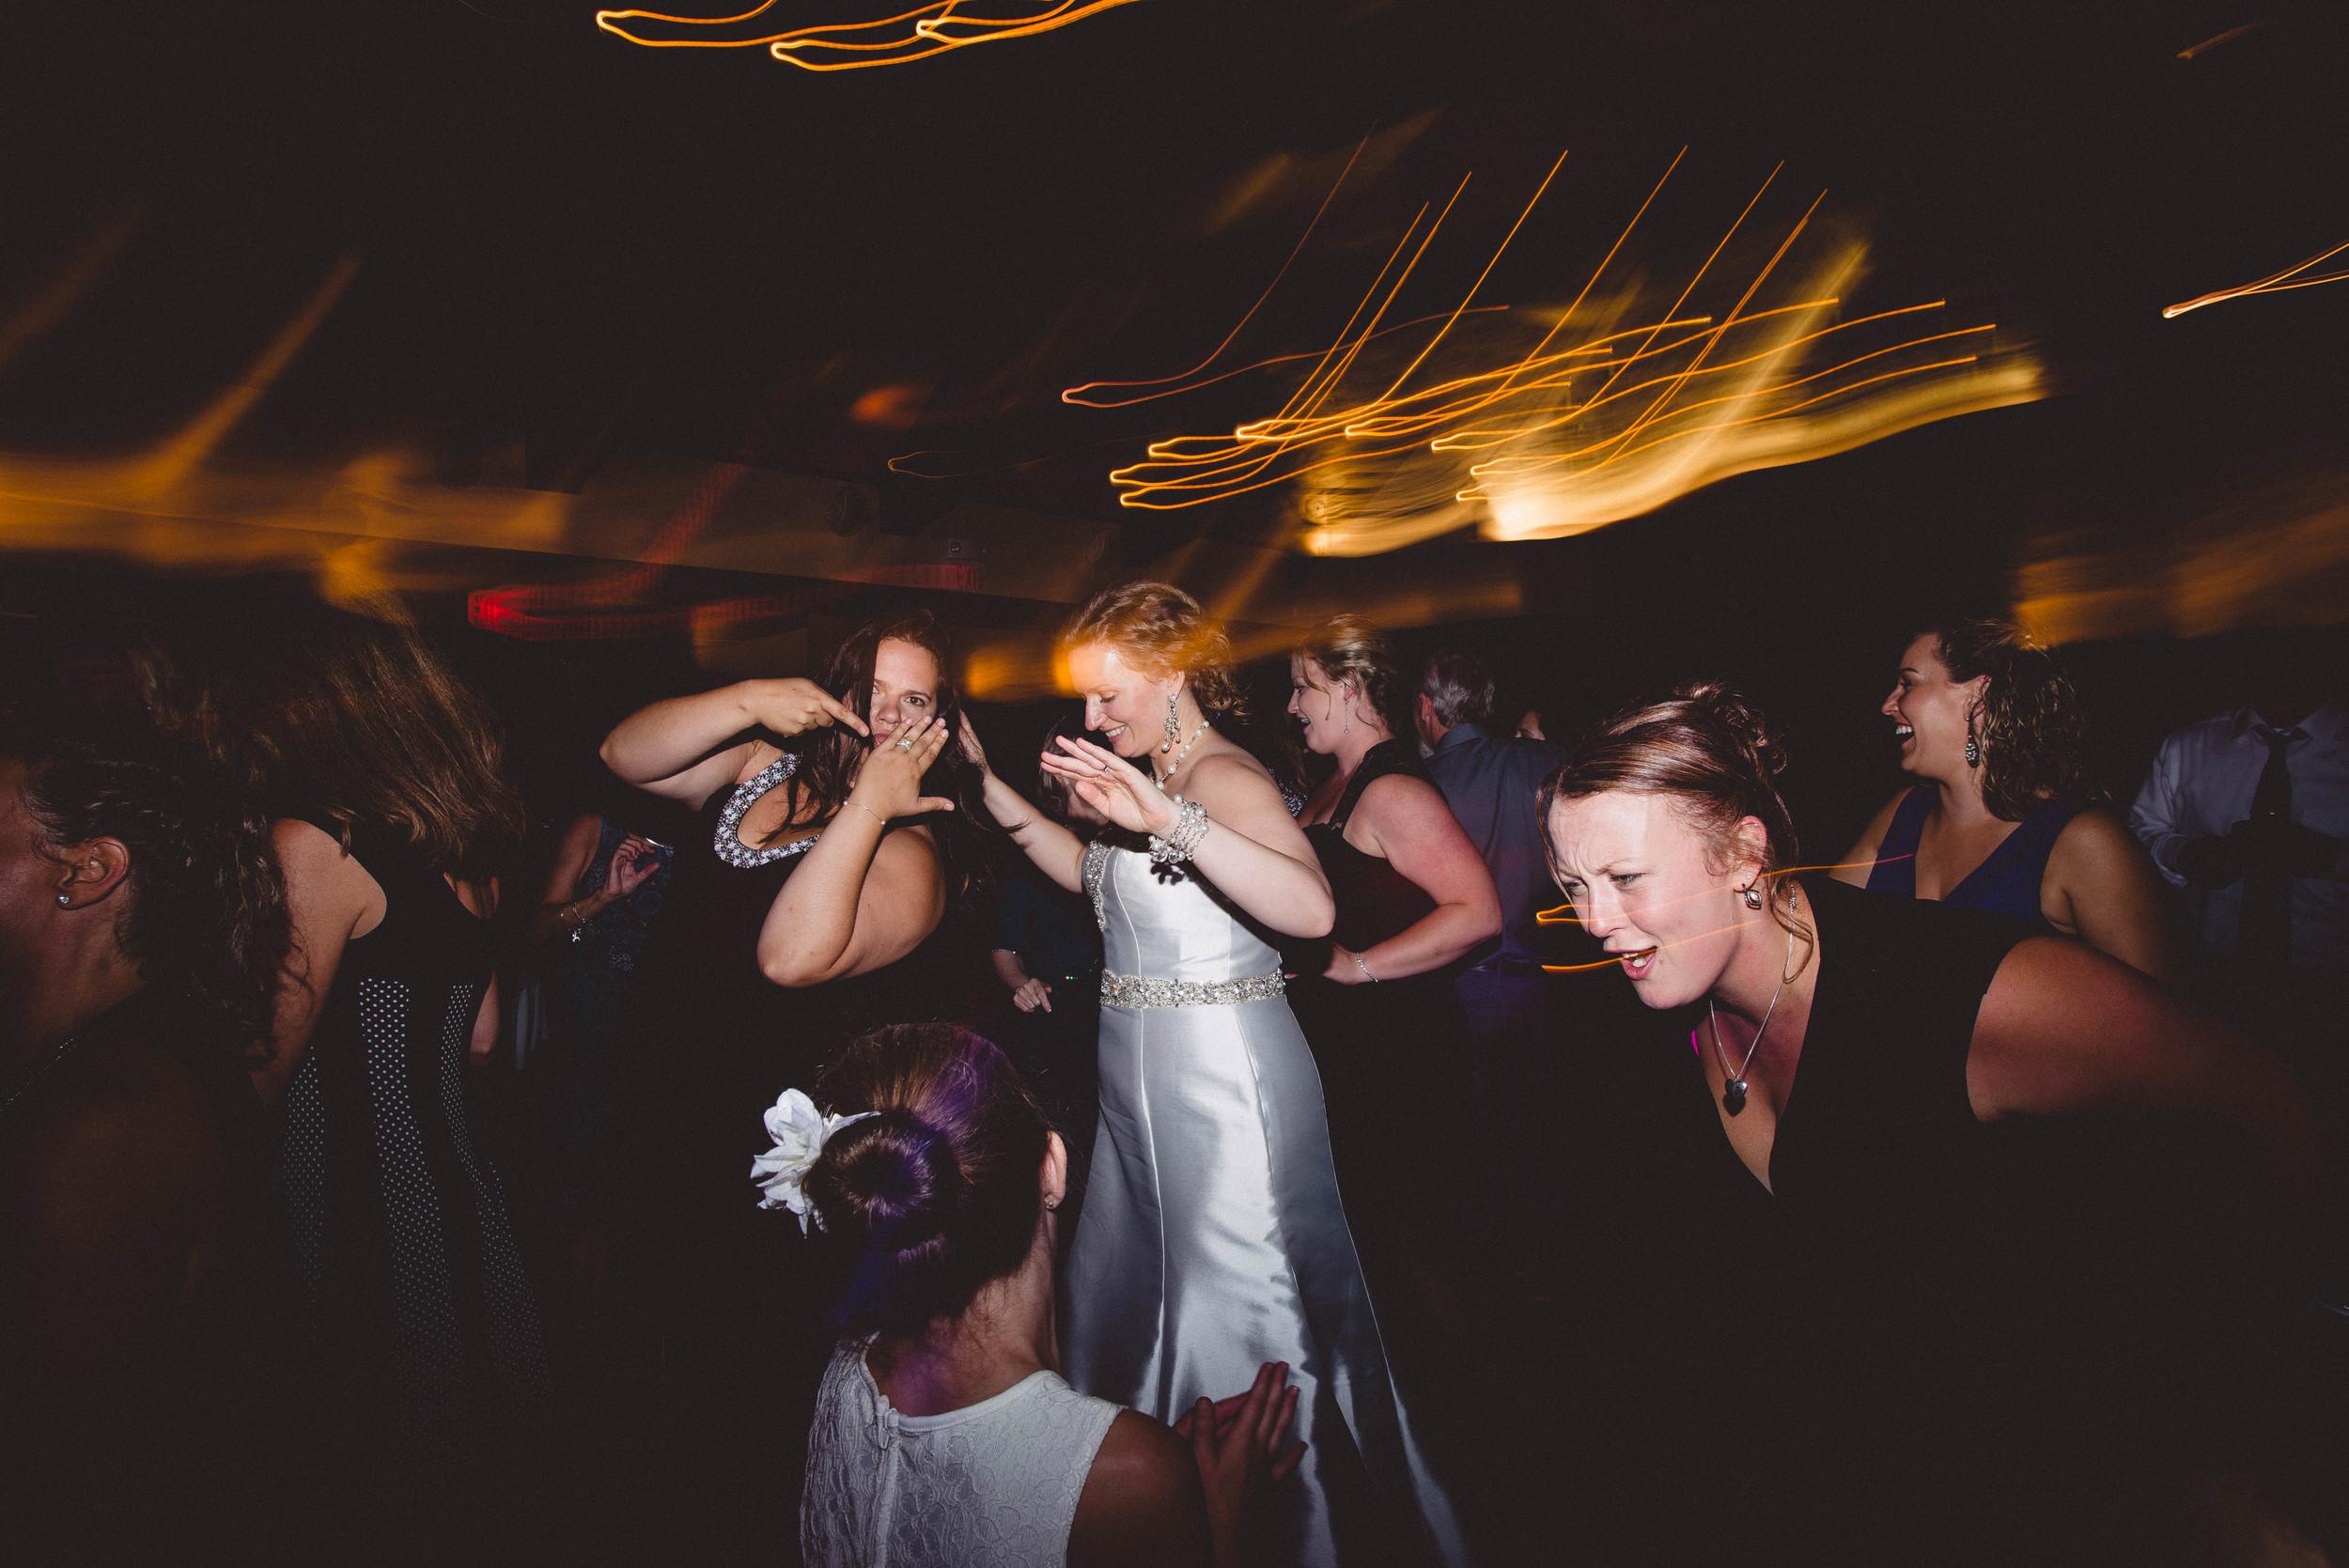 Matt and Shannon Wedding-20160730-22-03-08.JPG